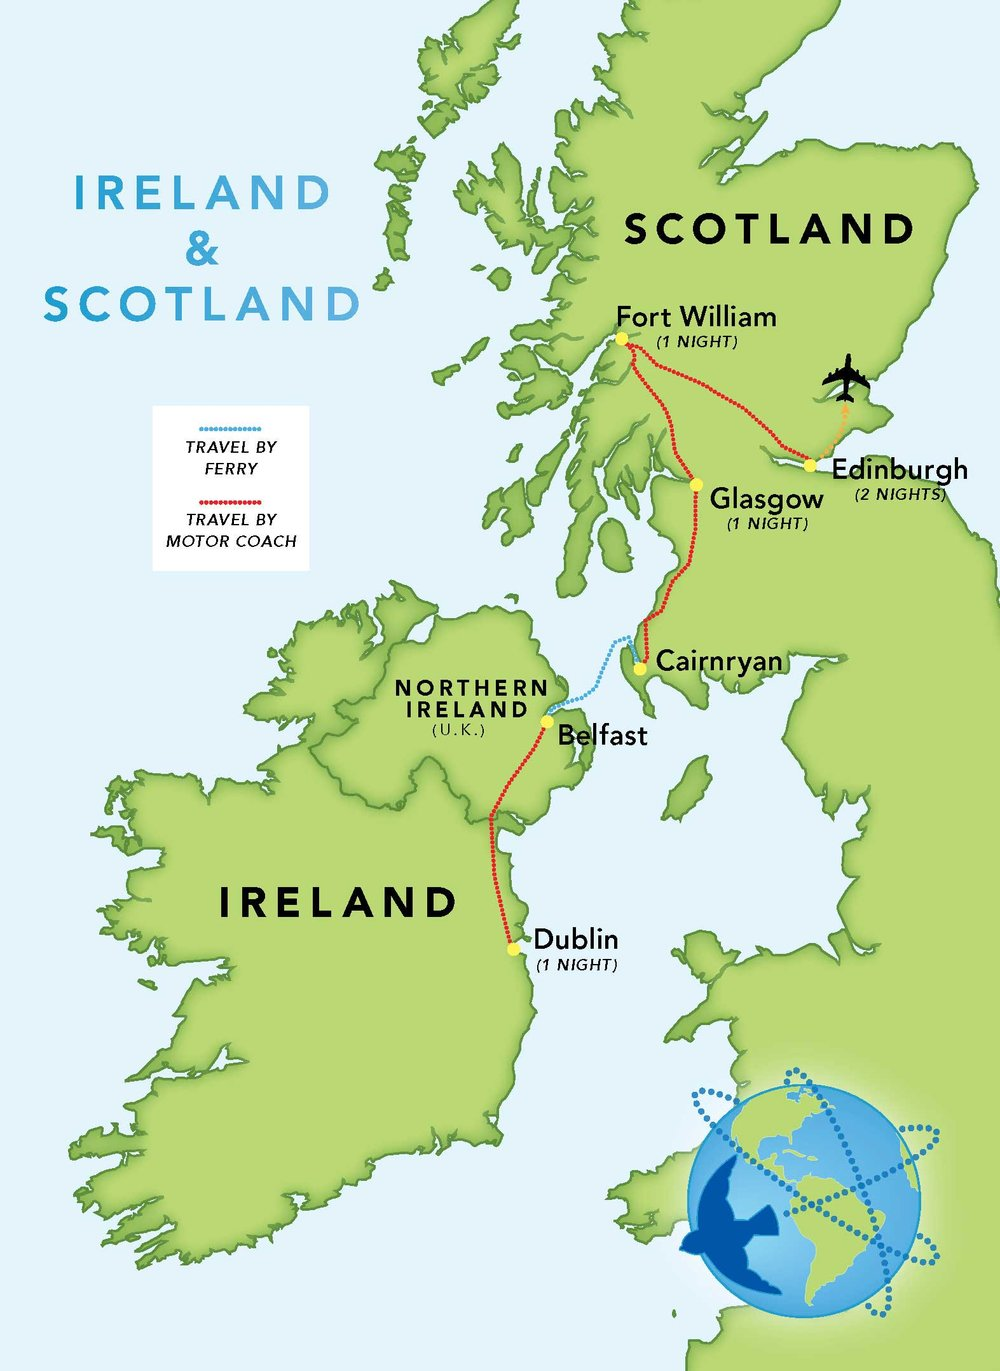 BGT_ireland-scotland-map.jpg